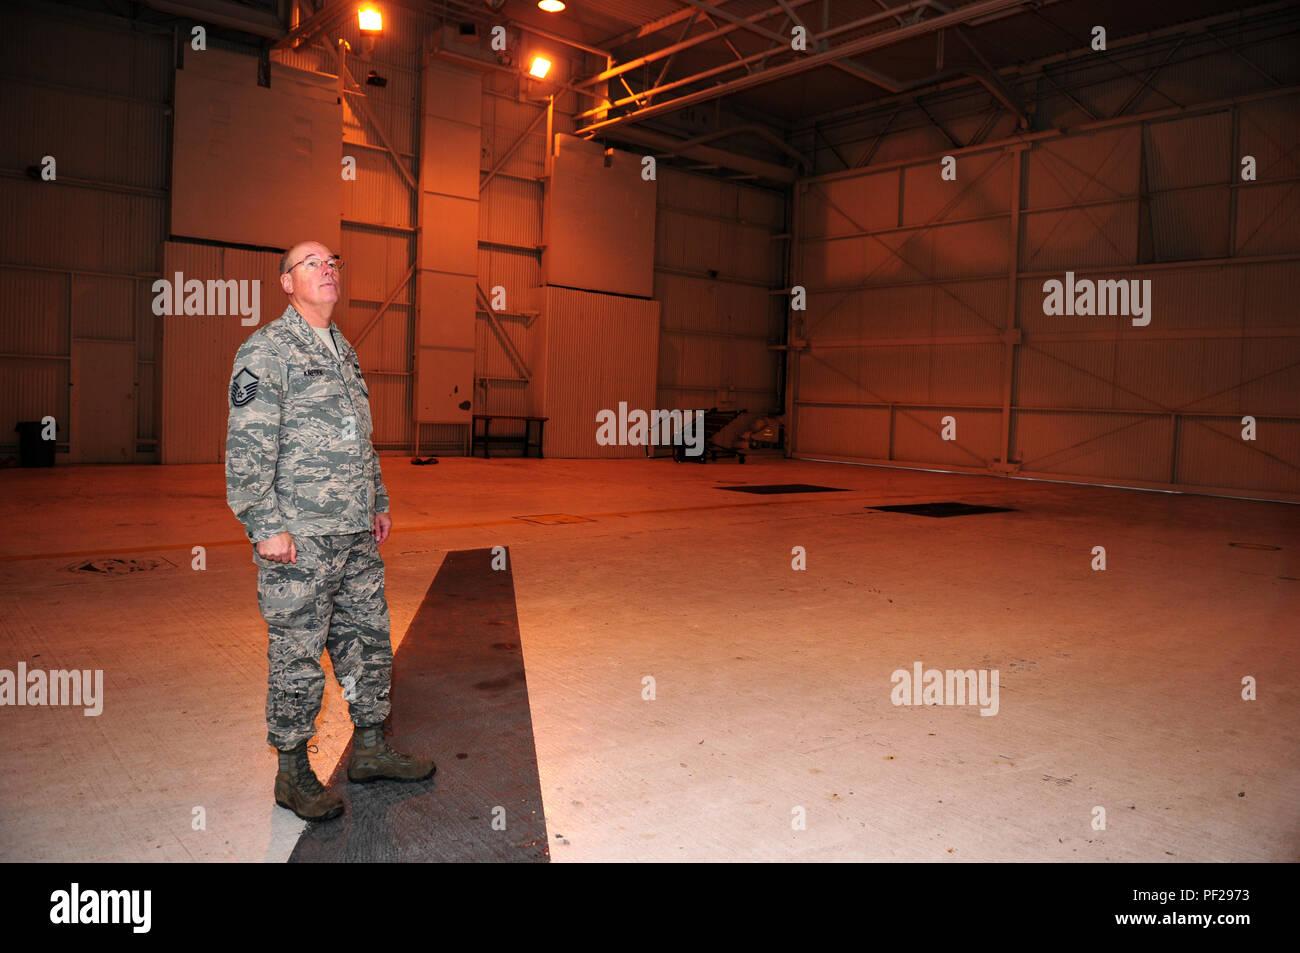 Empty Hangar Stock Photos & Empty Hangar Stock Images - Alamy